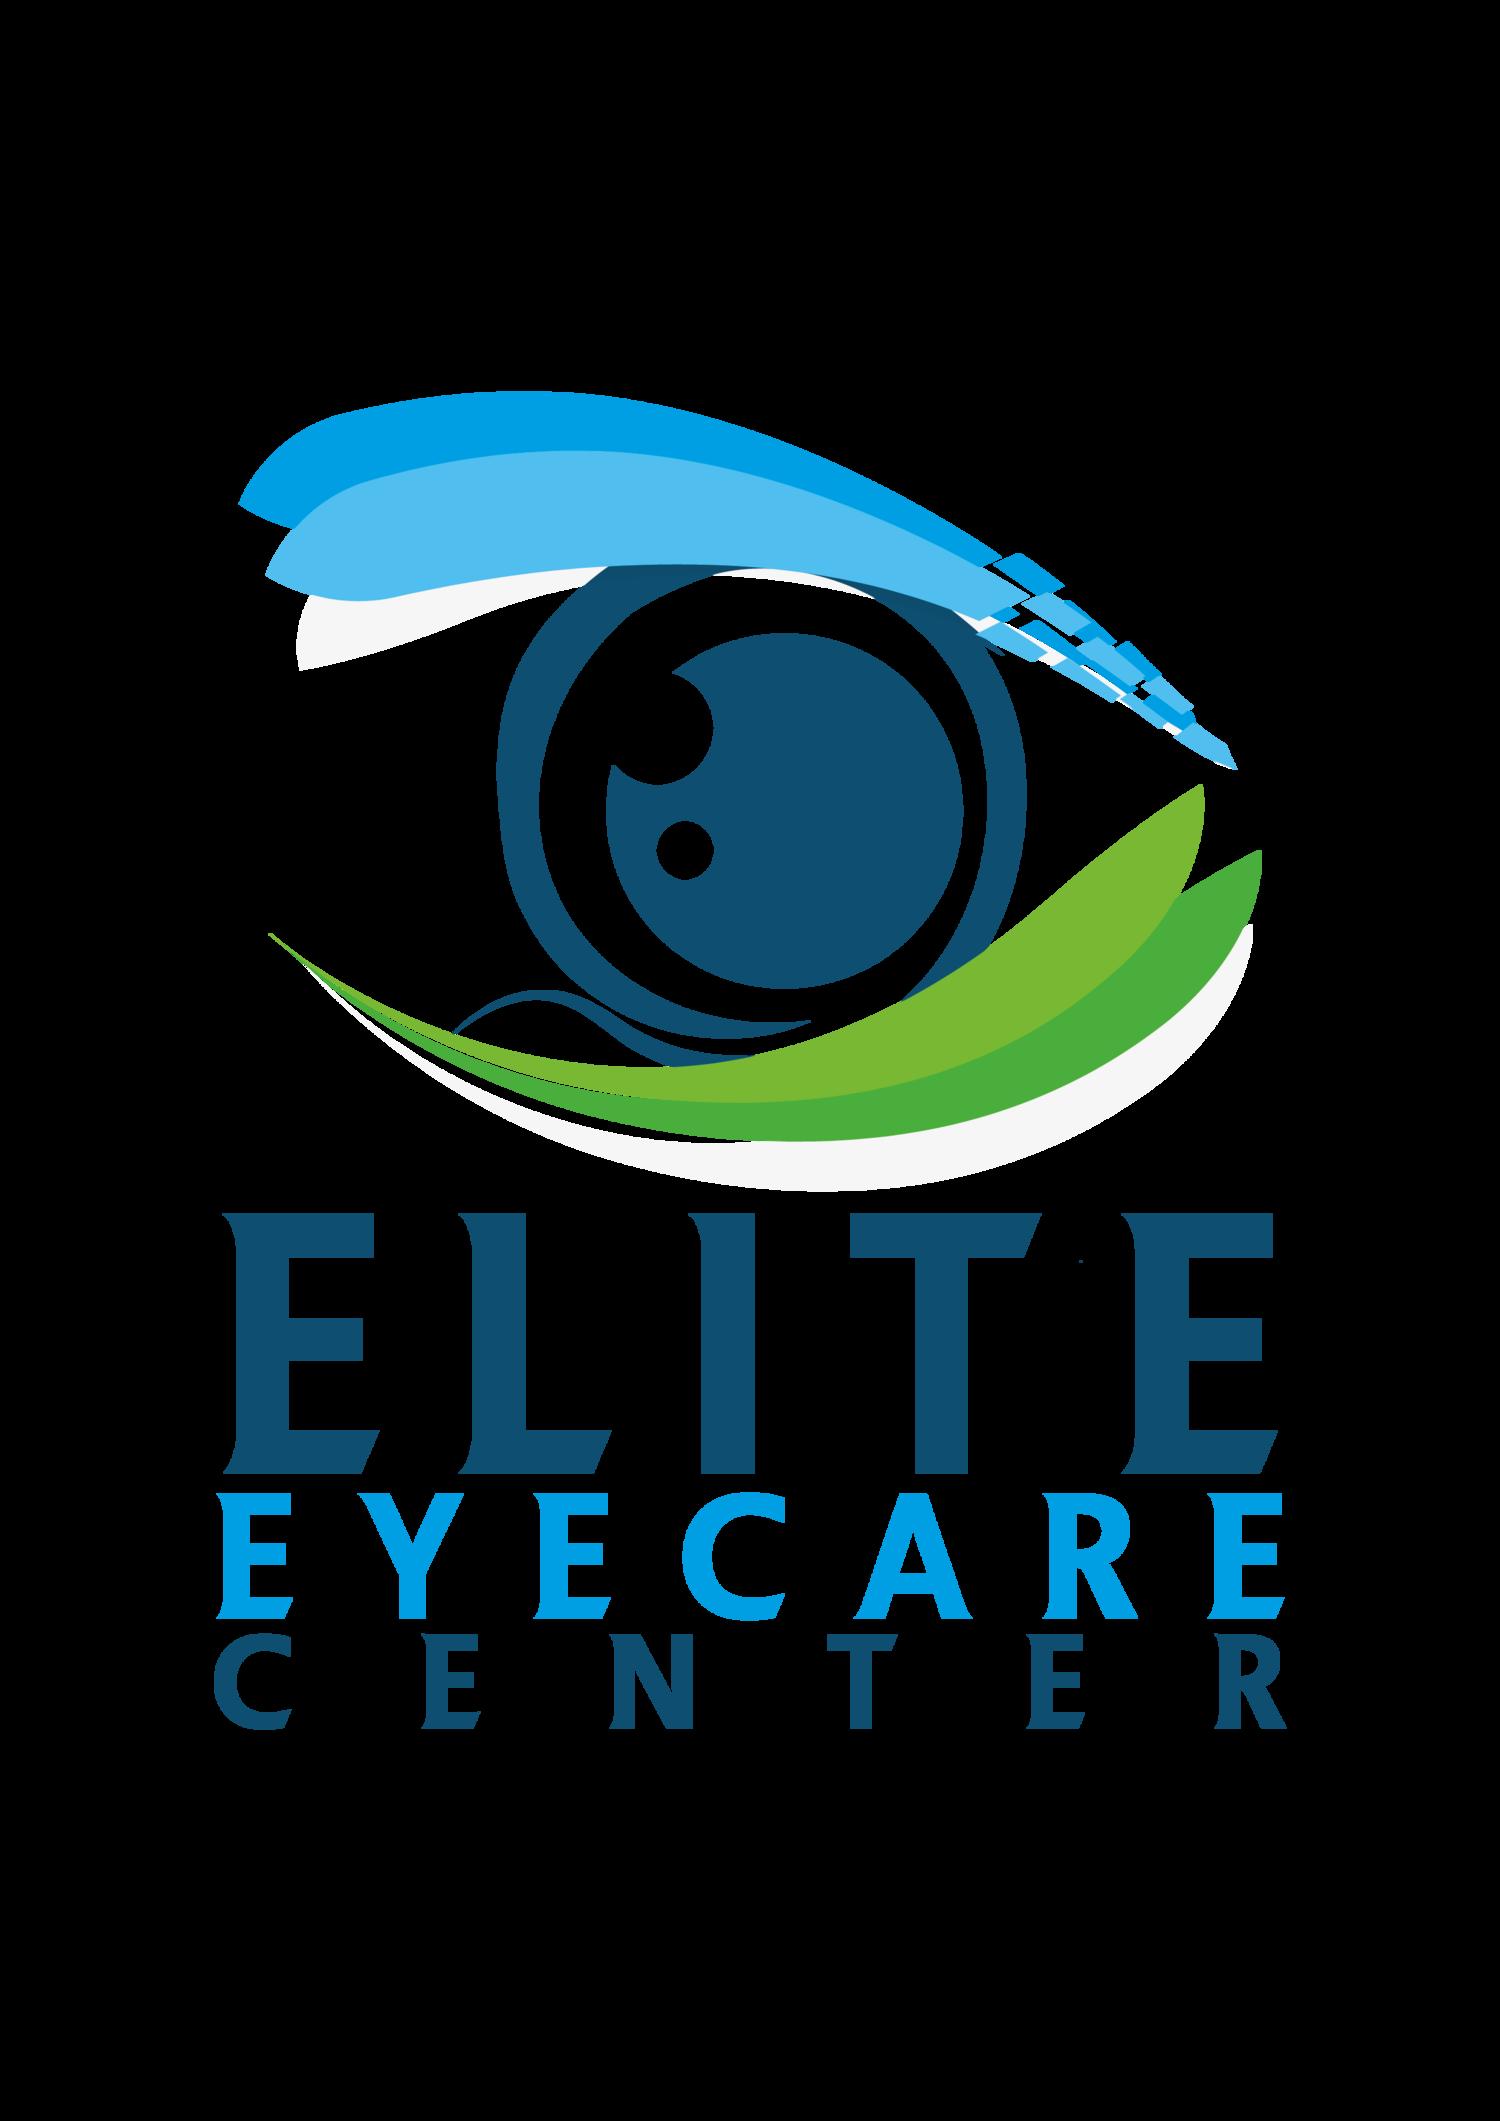 Elite Eyecare Center.